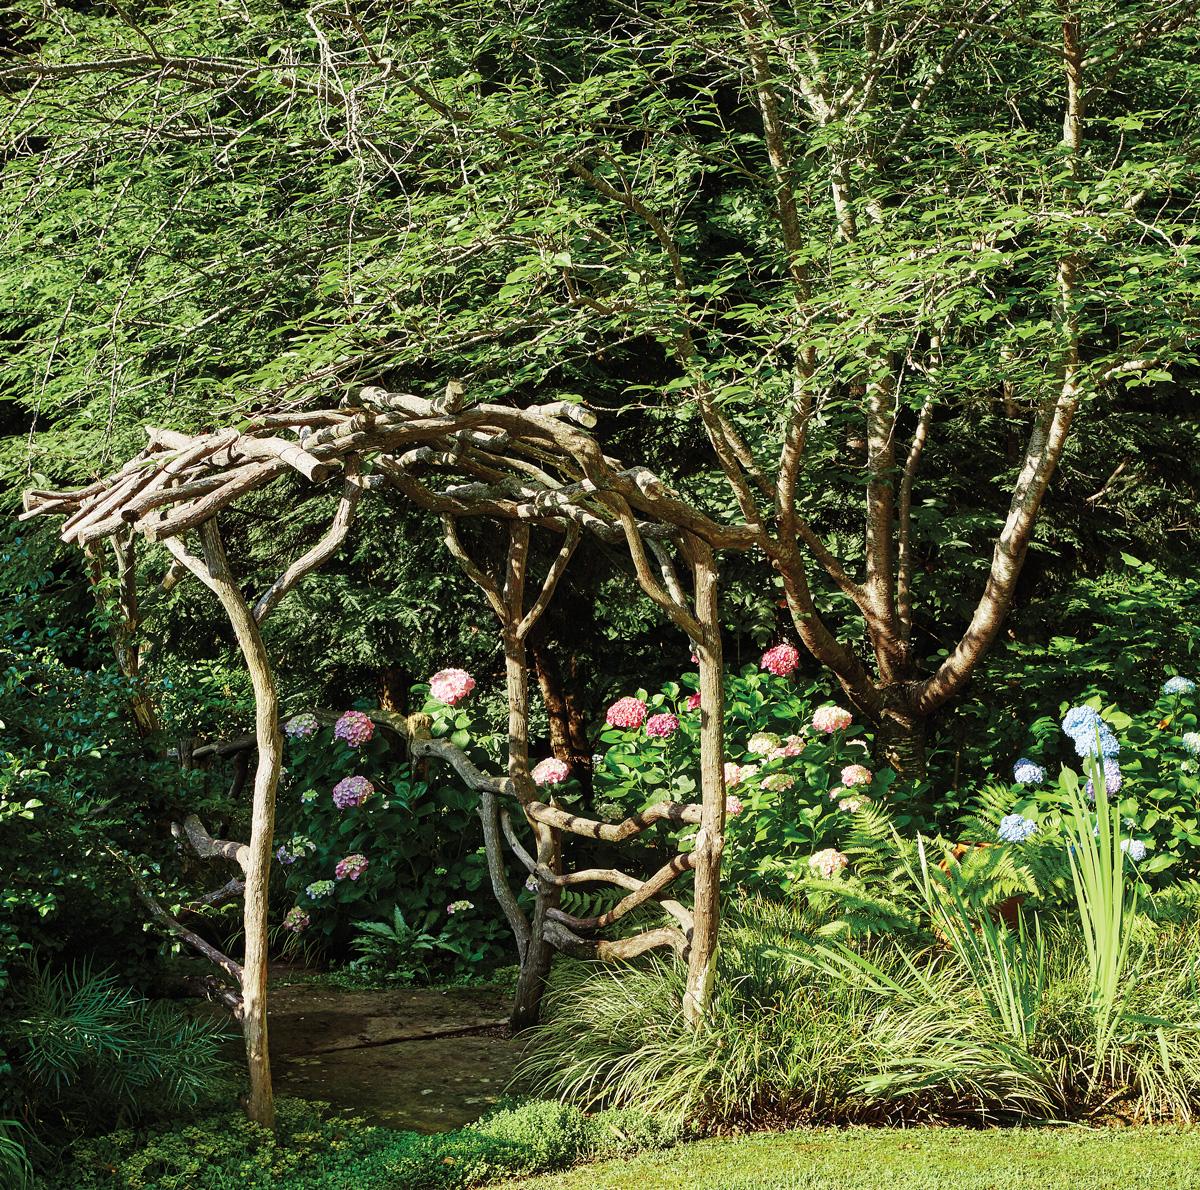 Twig arbor